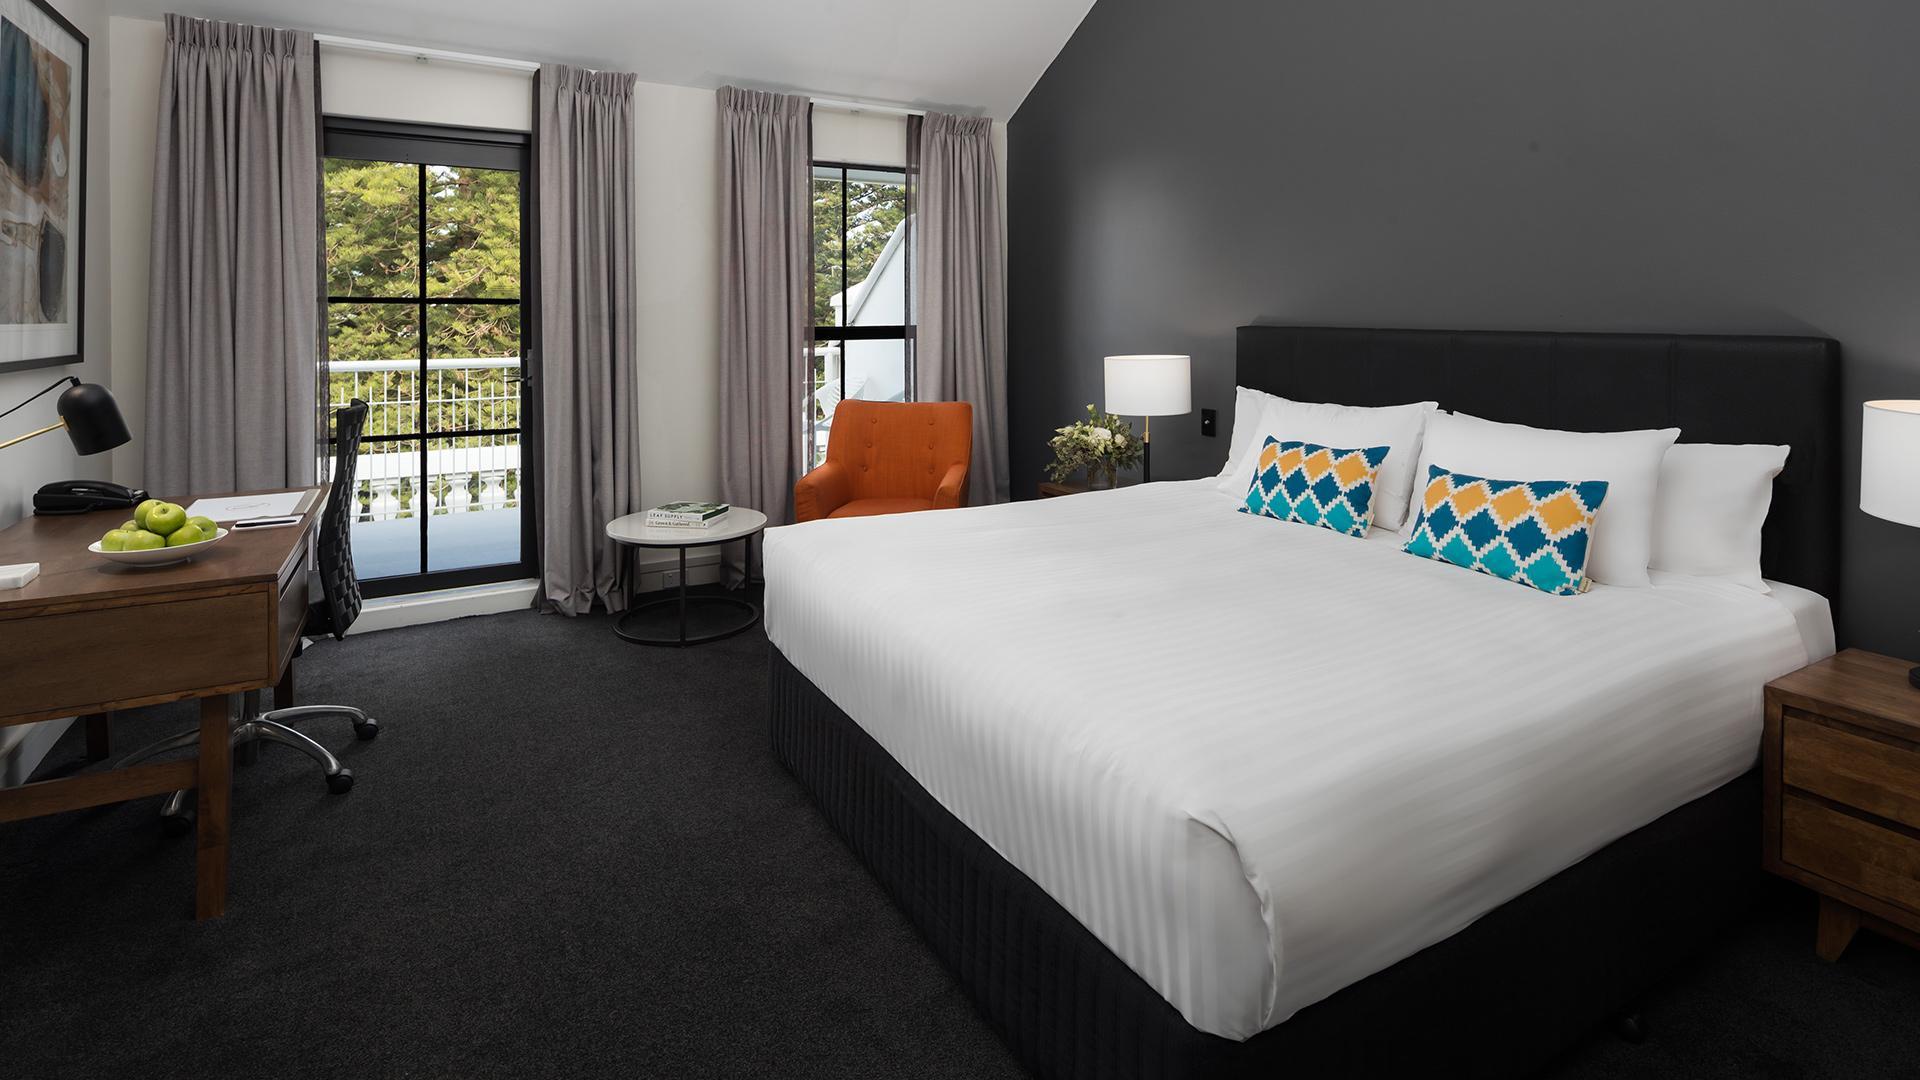 King Spa Room image 1 at Esplanade Hotel Fremantle by Rydges  by City of Fremantle, Western Australia, Australia